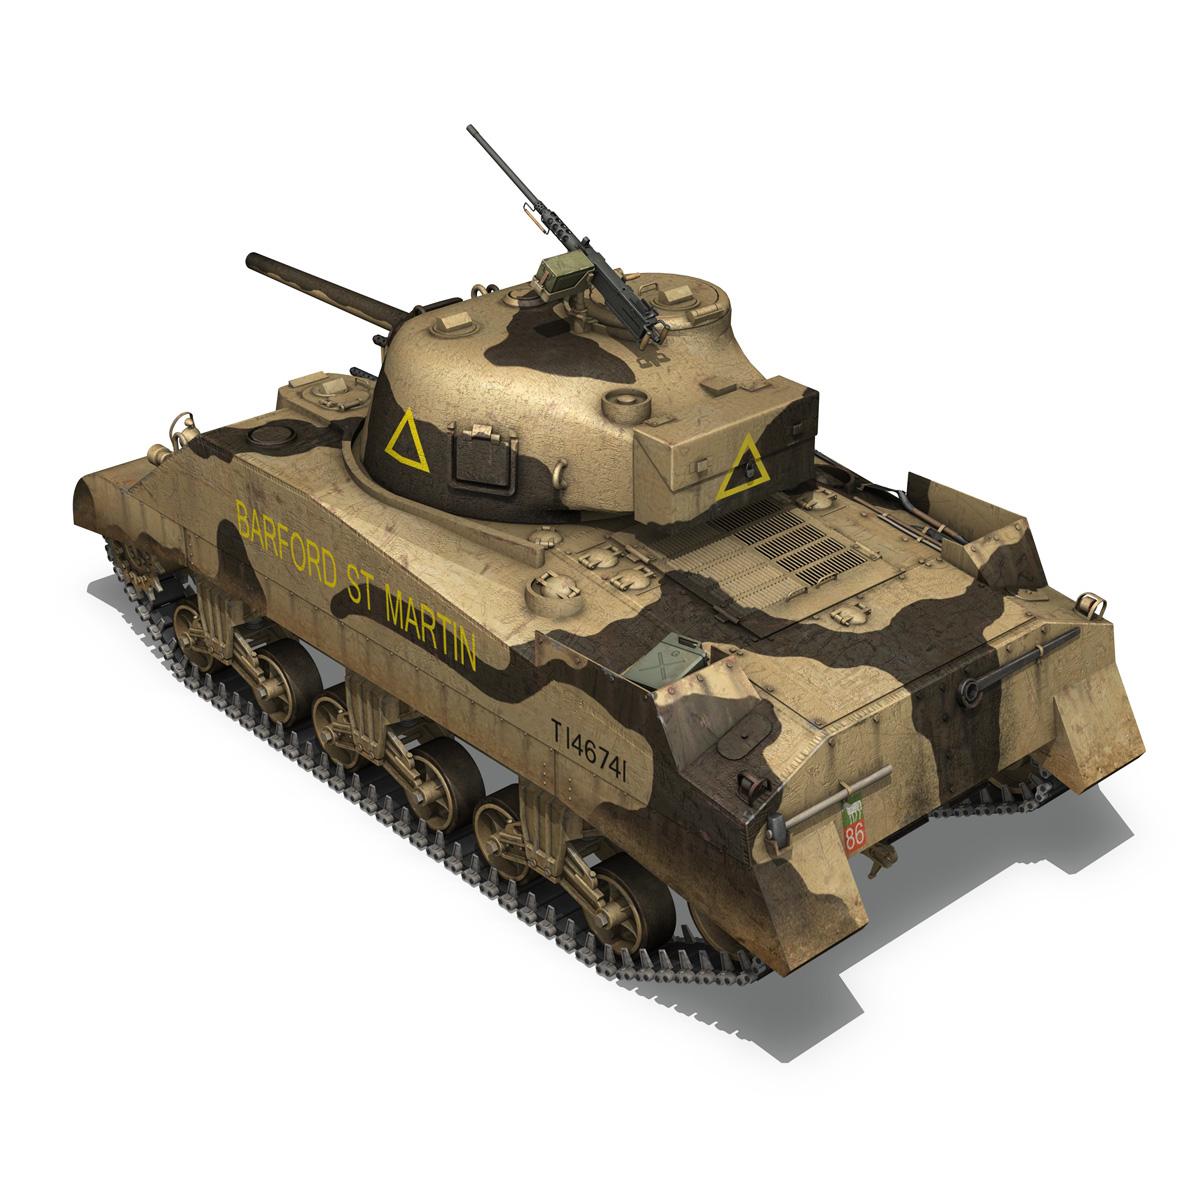 M4 Sherman MK.III - Barford St Martin 3d model  266954